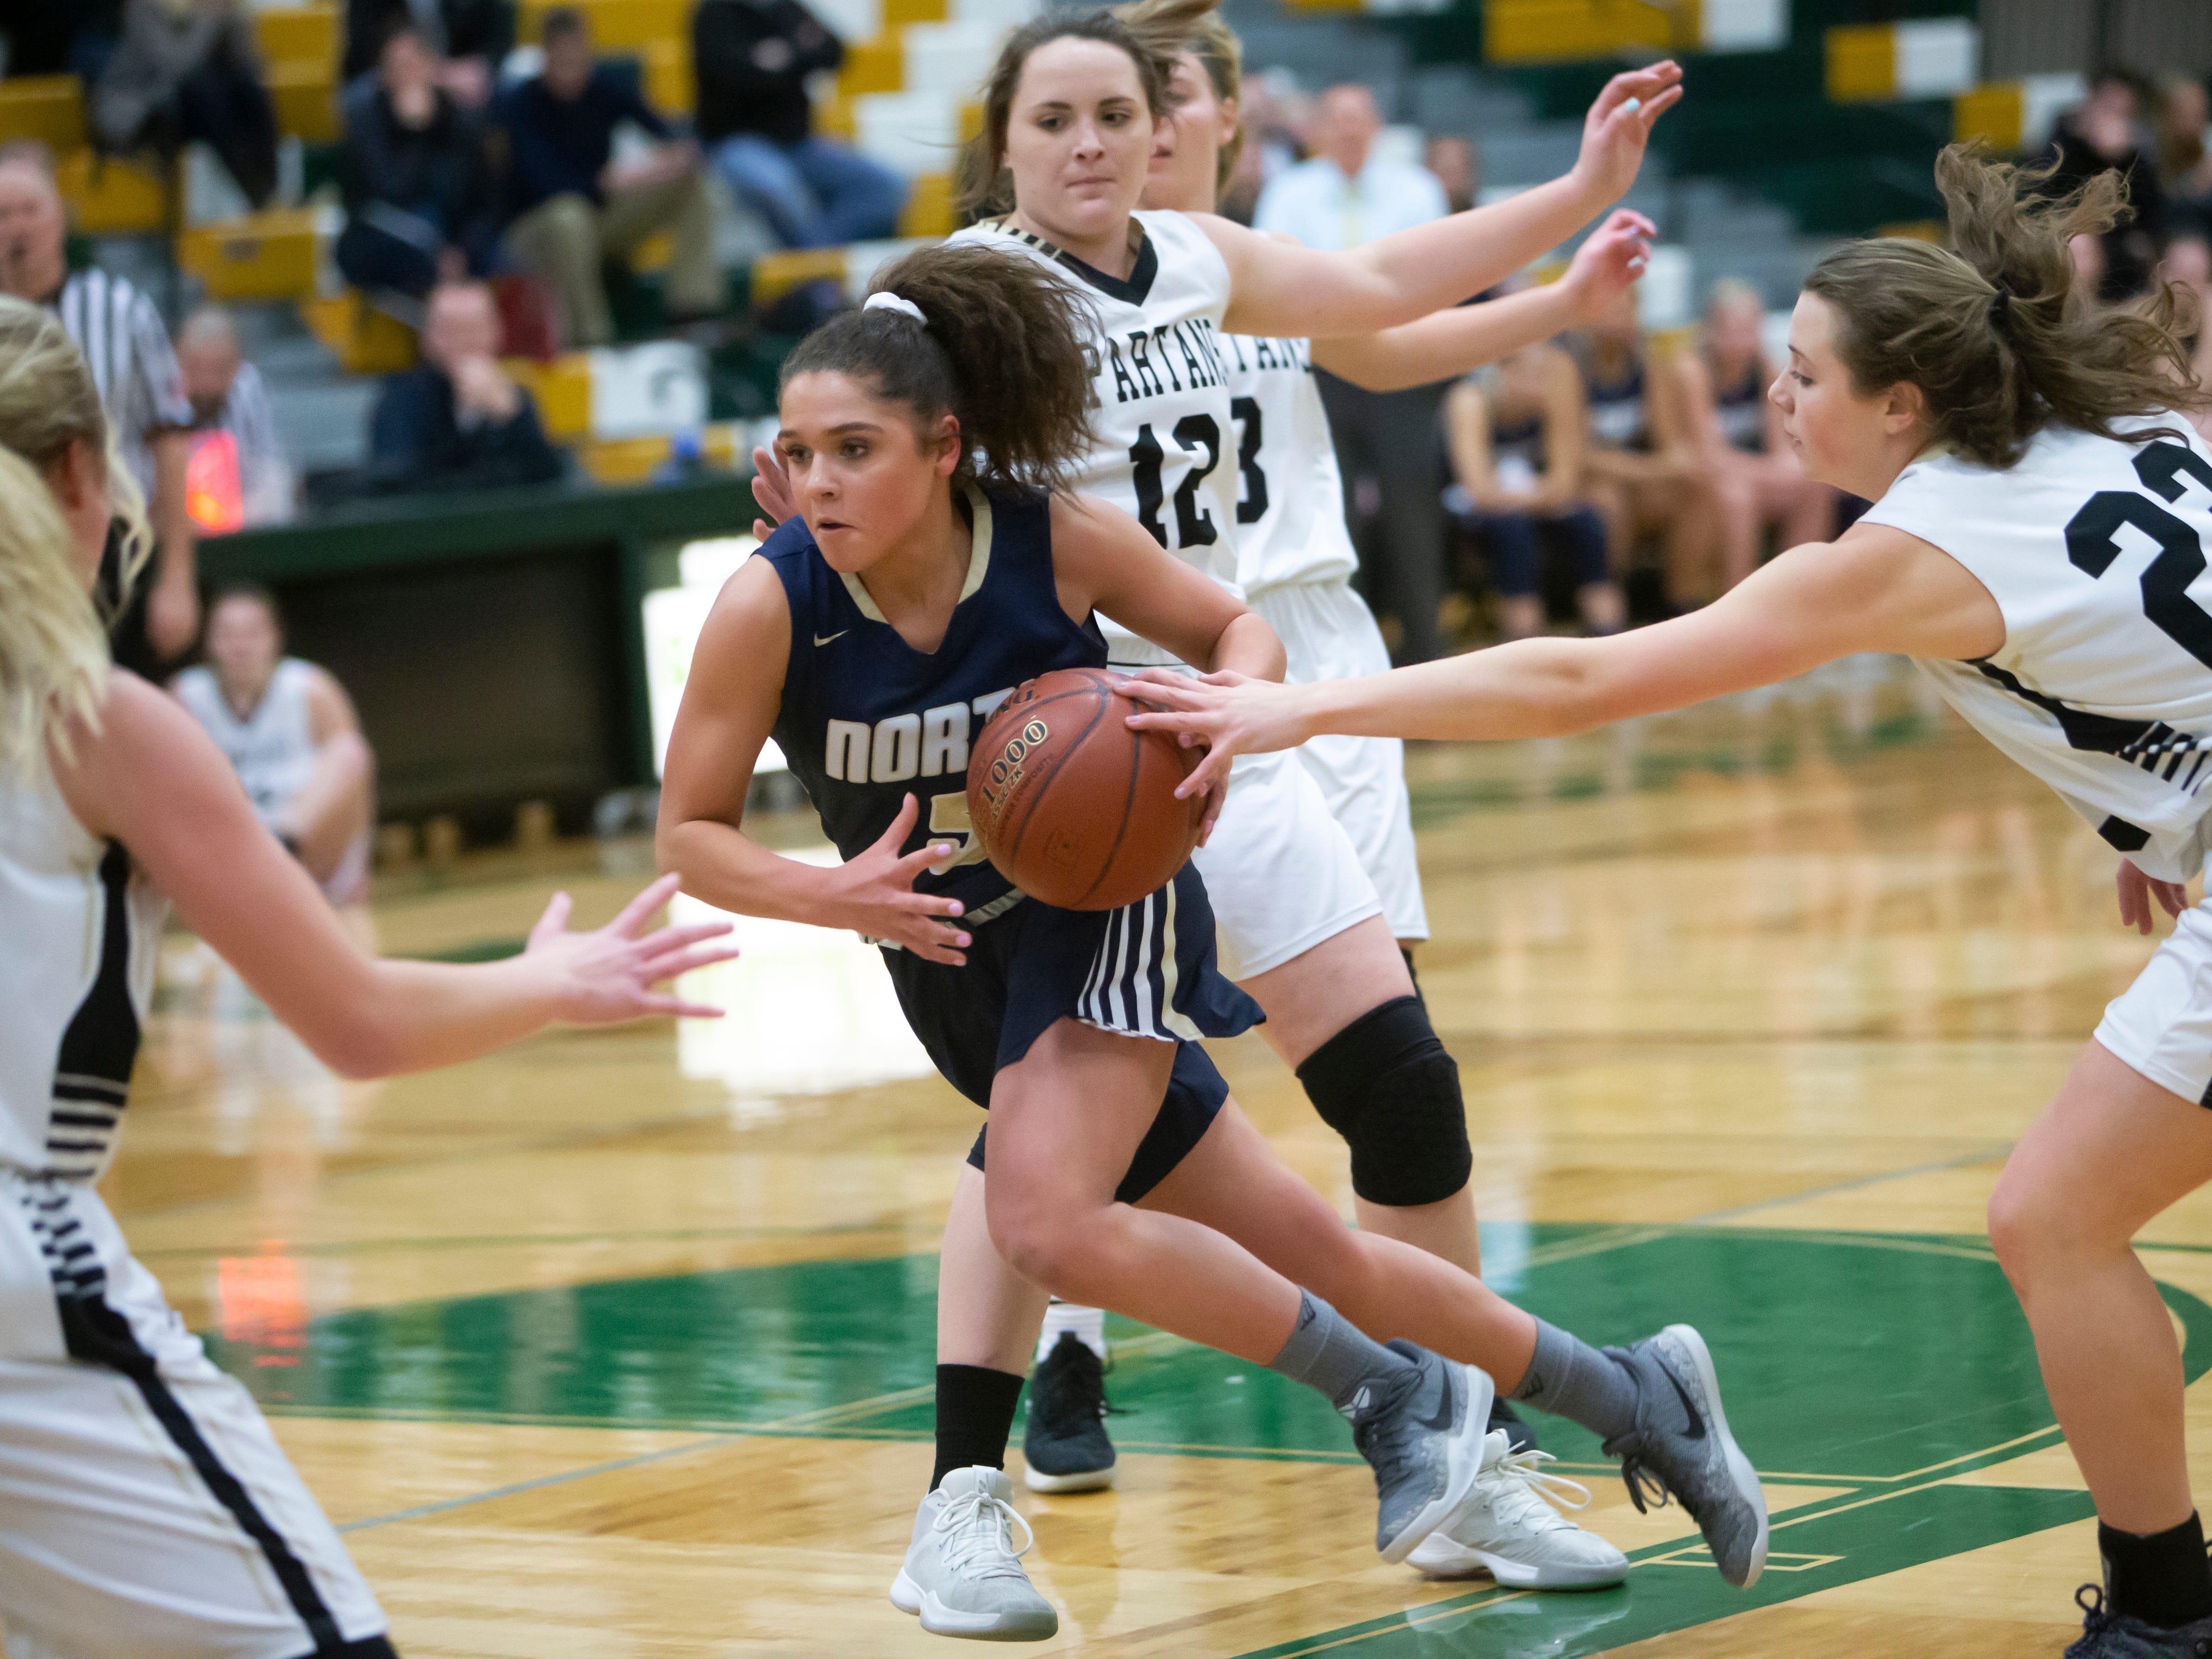 Appleton North's Niki Van Wyk drives the ball through Spartan traffic during the girls basketball game Friday, February 8, 2019, in Oshkosh, Wis., at Oshkosh North High School.